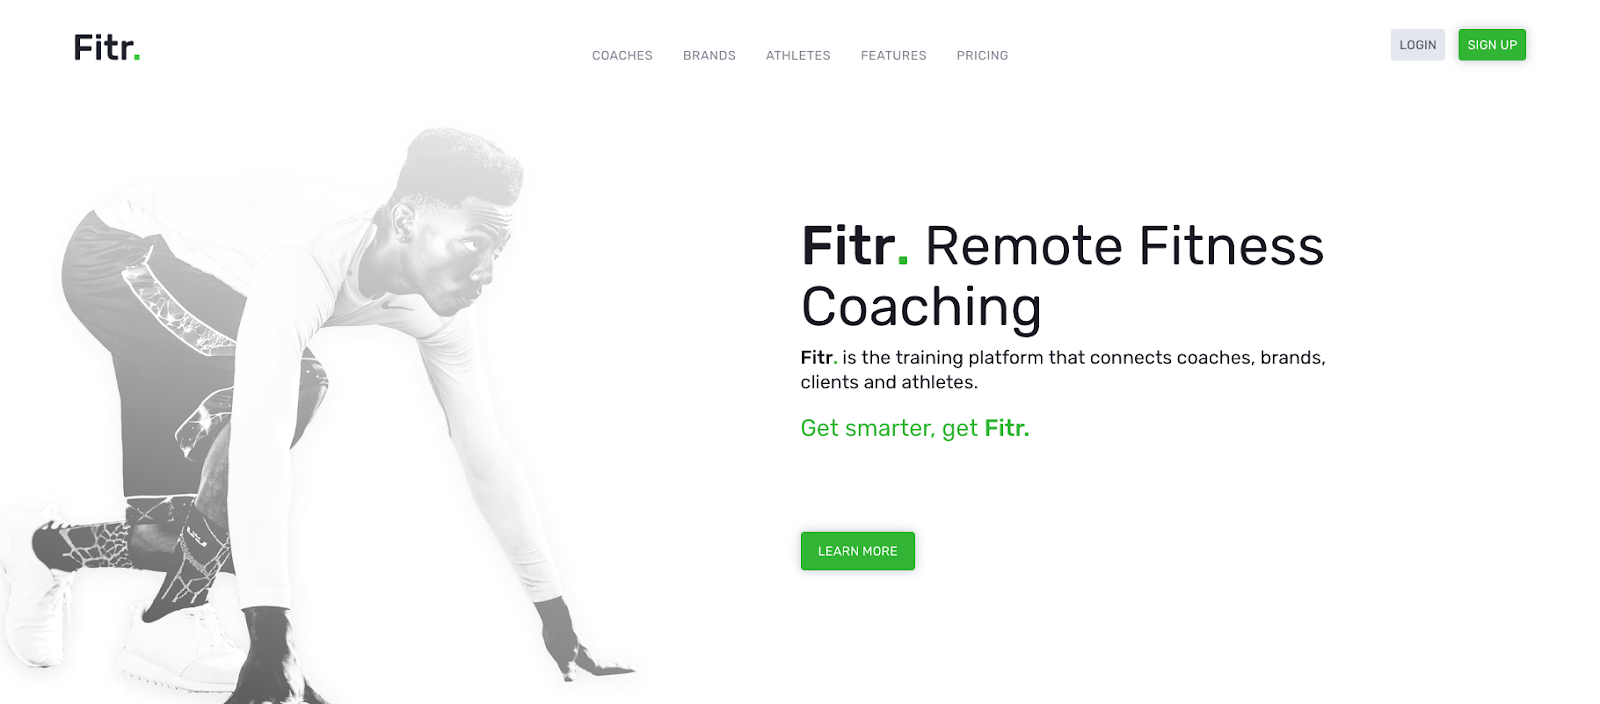 Fitr's new website